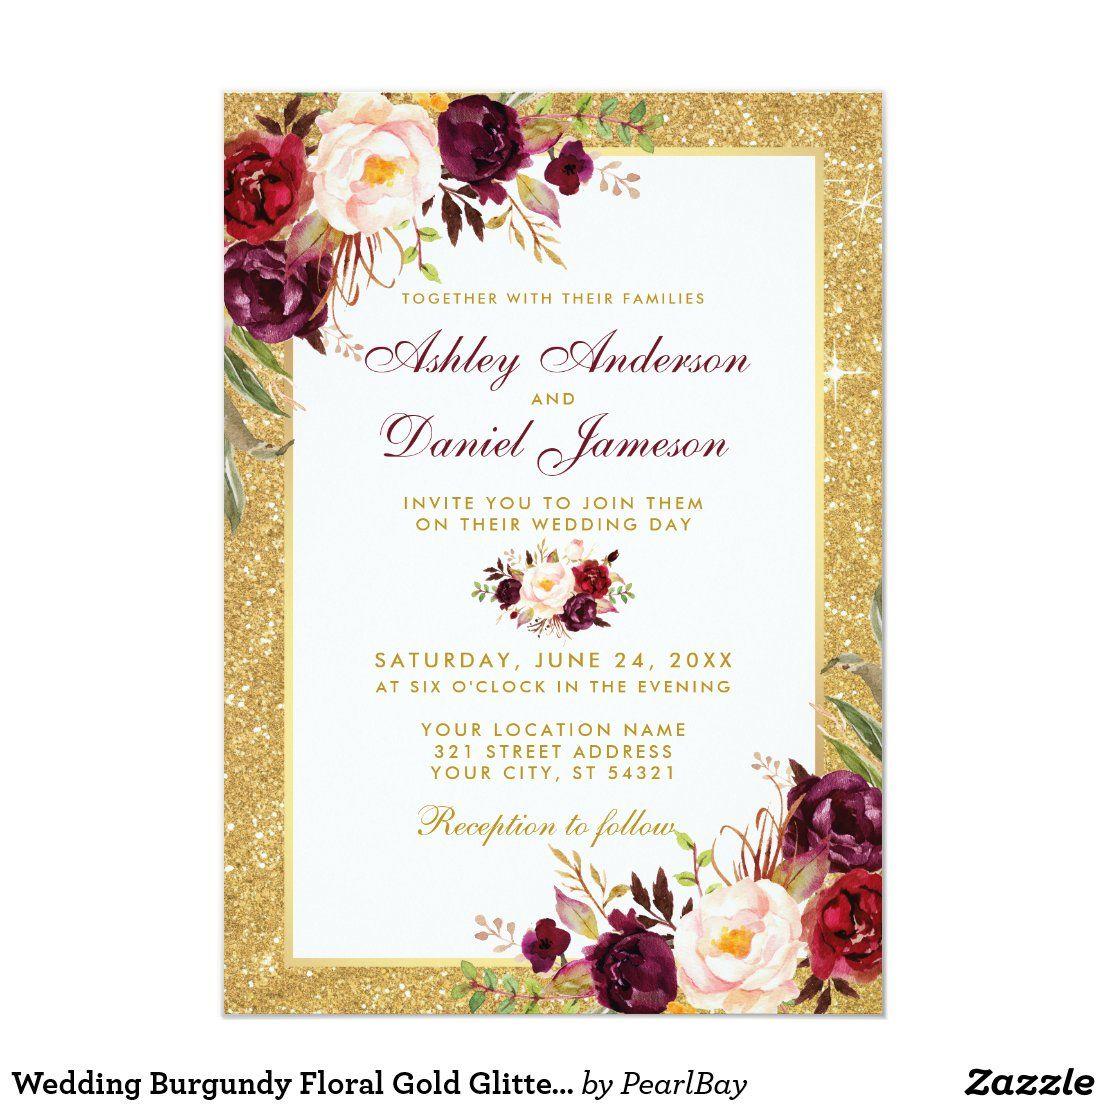 Wedding Burgundy Floral Gold Glitter Invitation